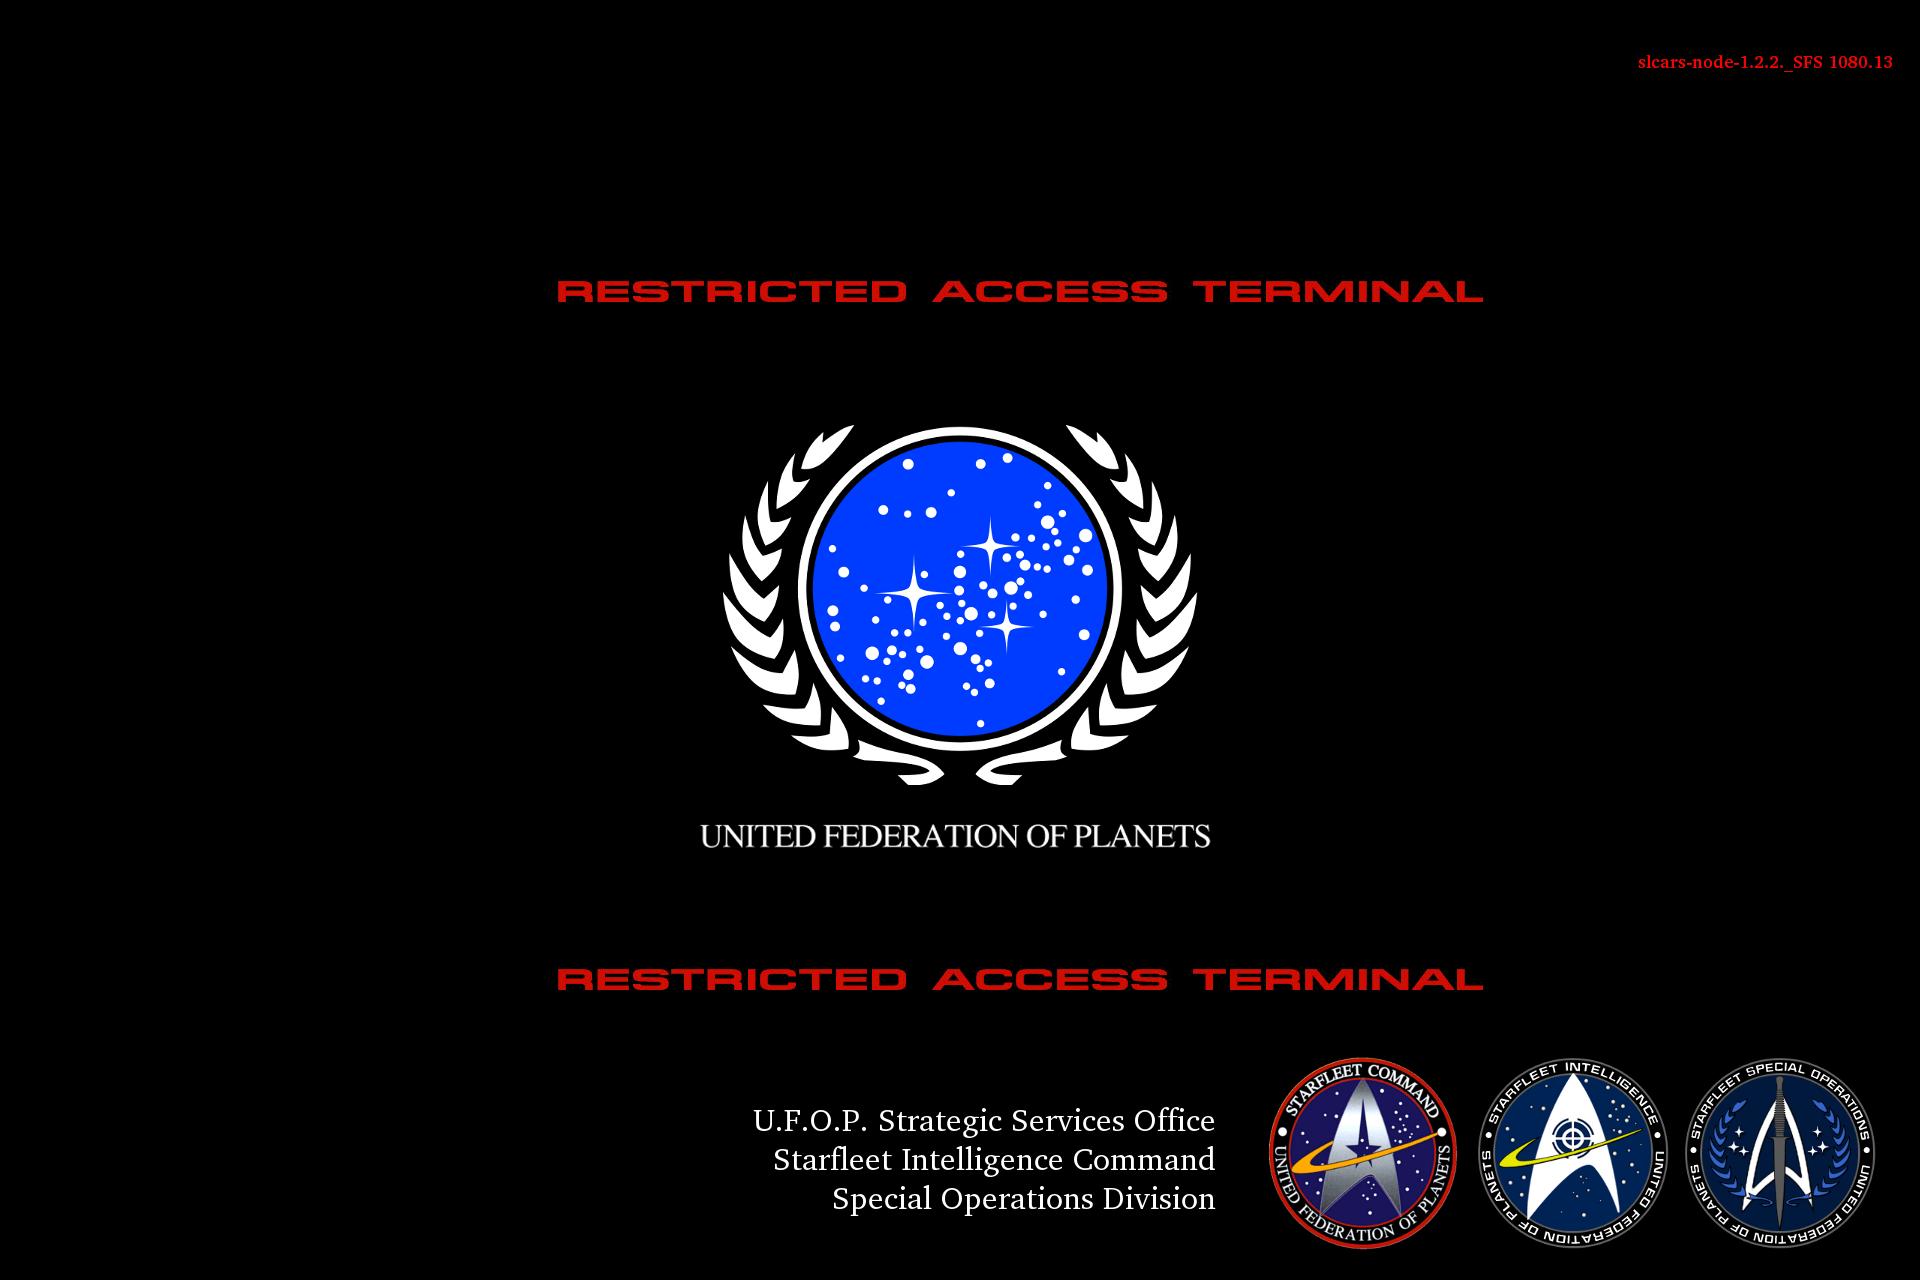 star trek starfleet command wallpaper - photo #15